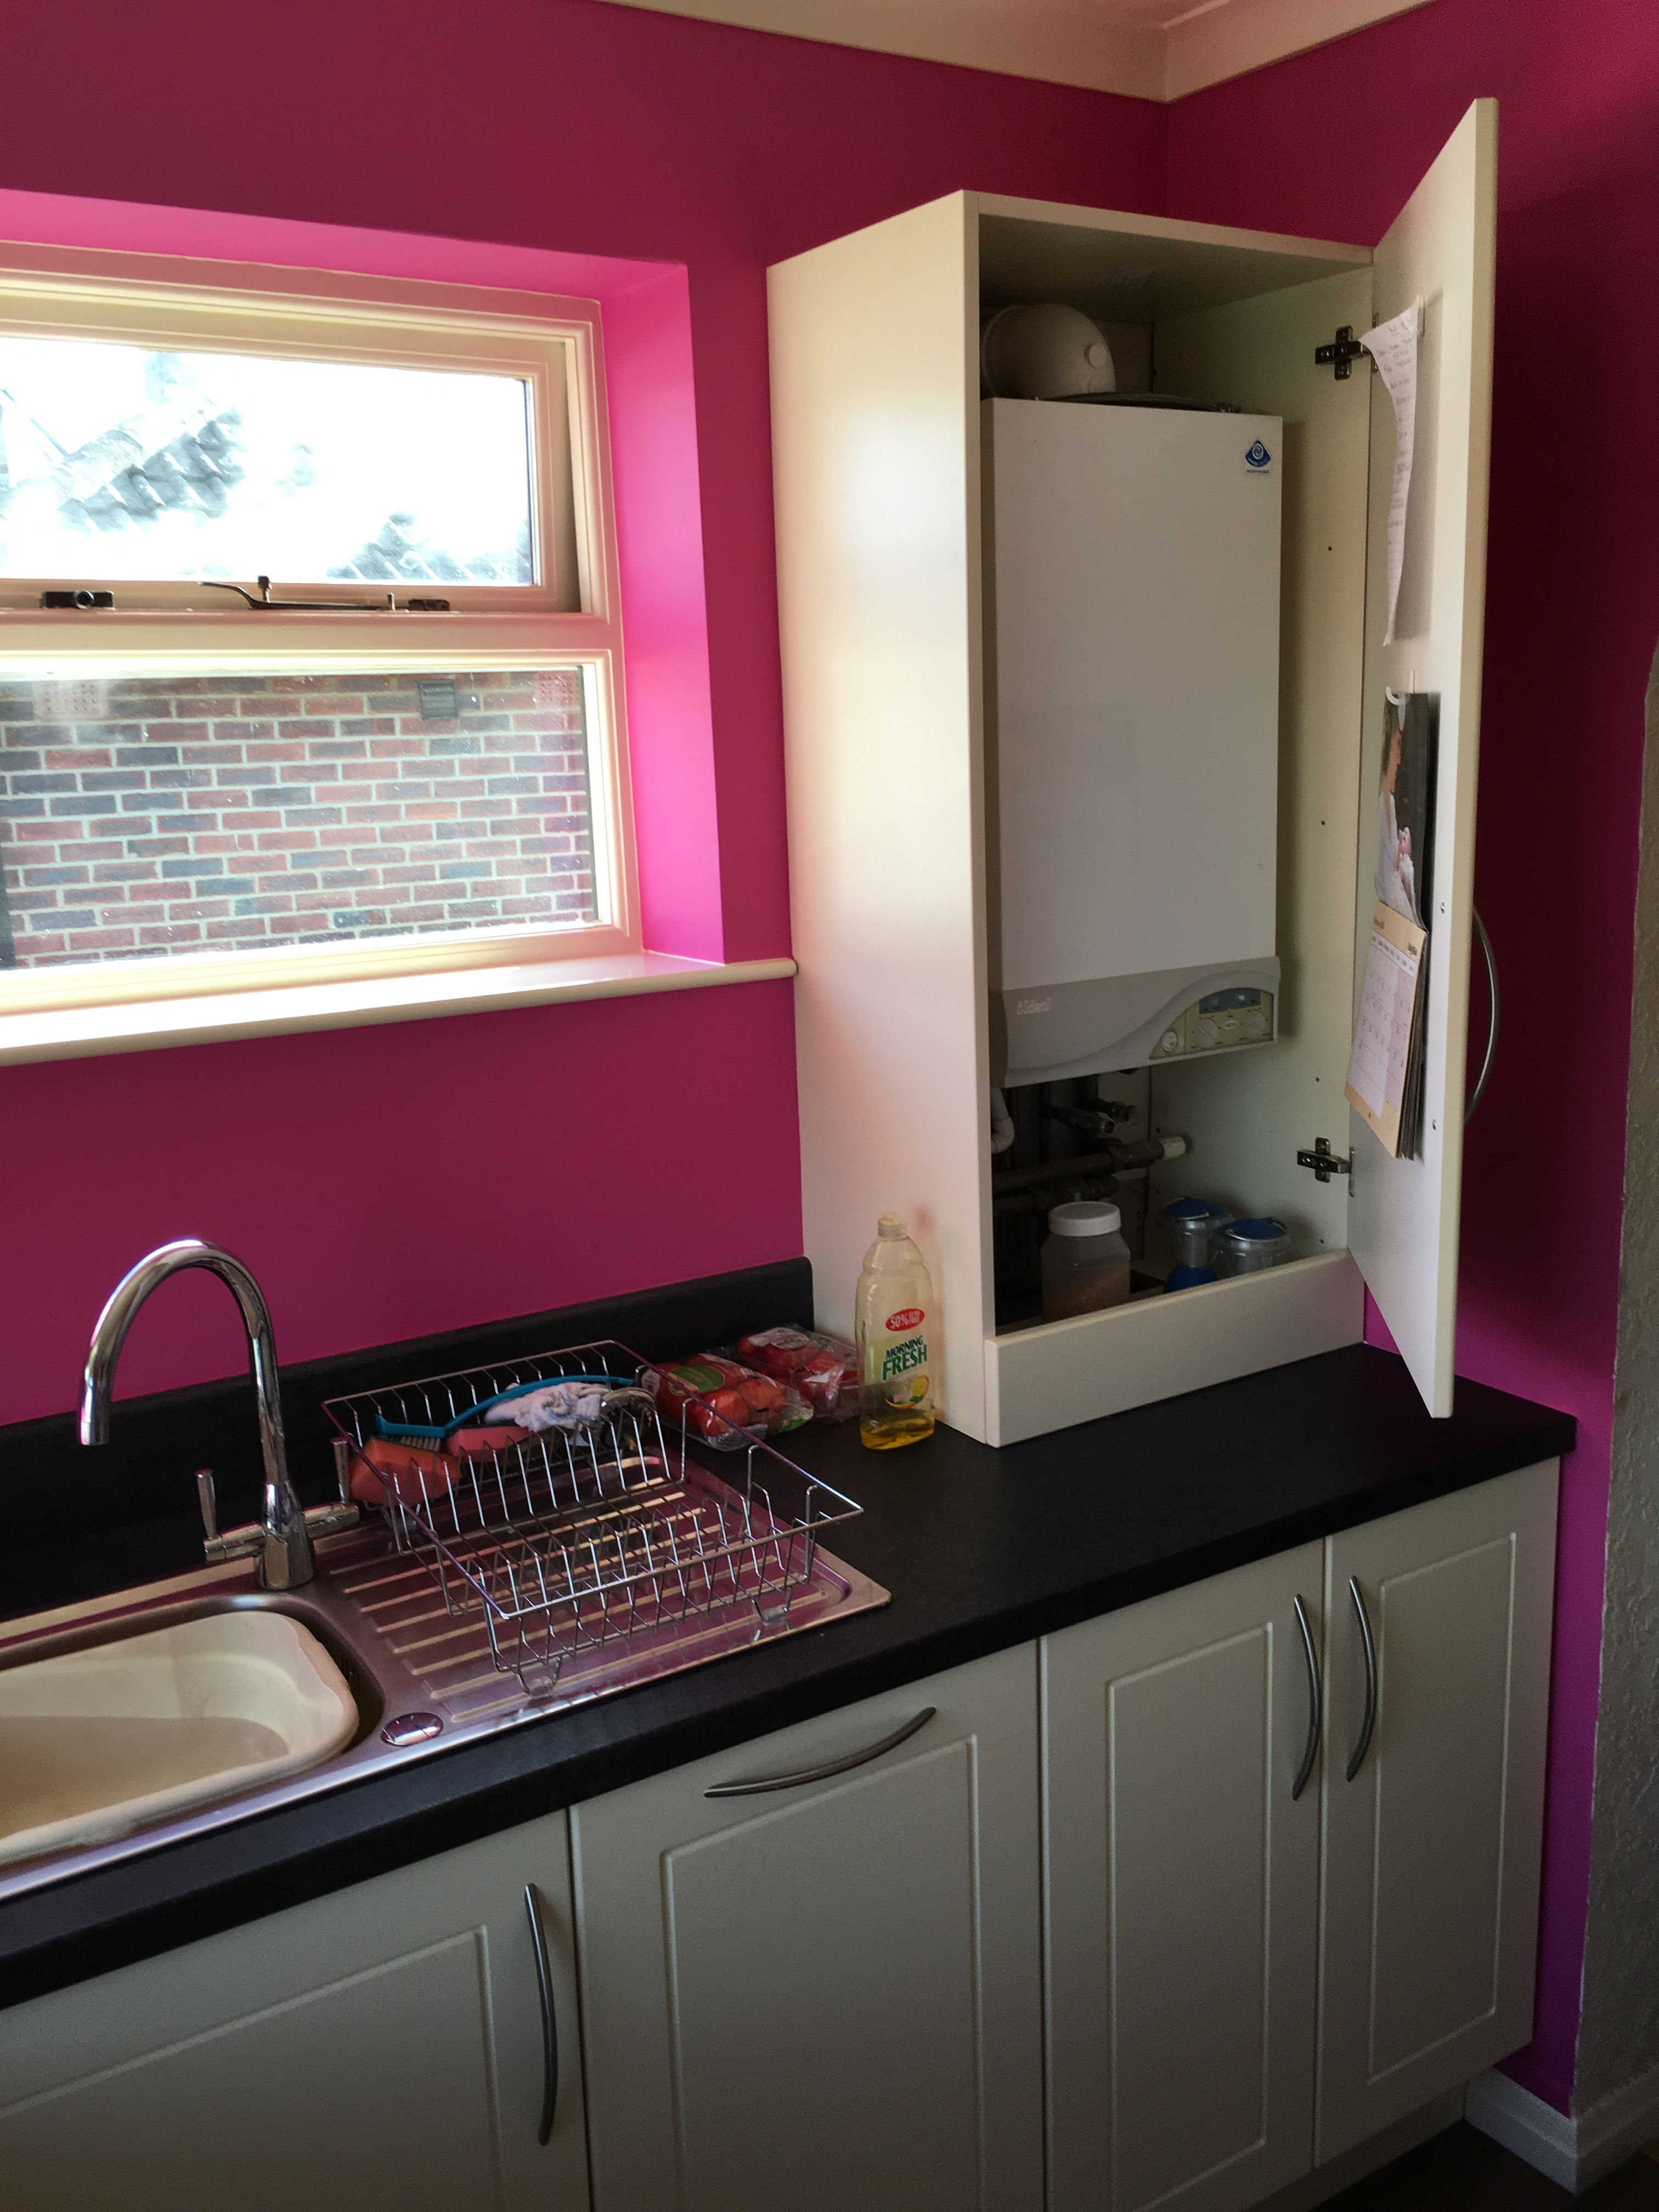 Boiler Housing Hidden Kitchen Kitchen Cupboards Boiler Cover Ideas